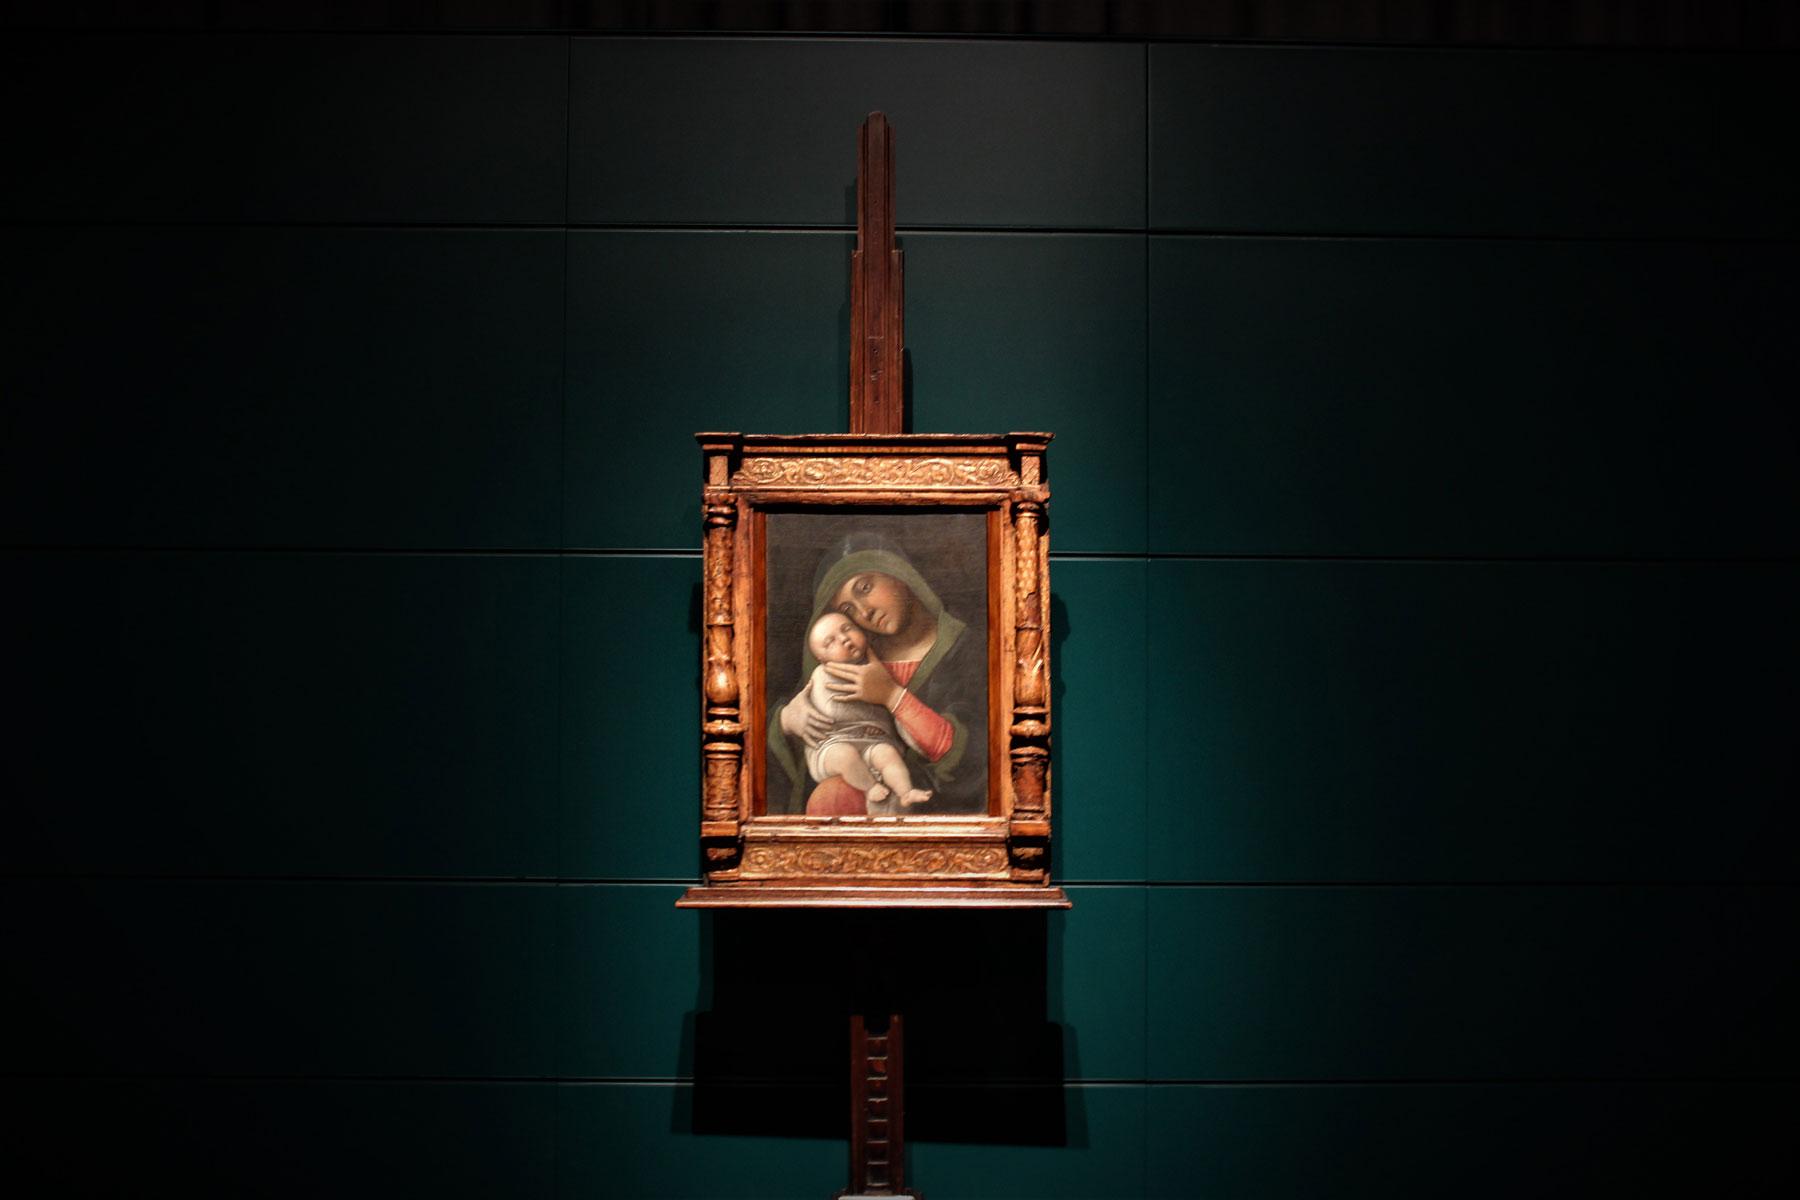 L'opera al Museo Poldi Pezzoli